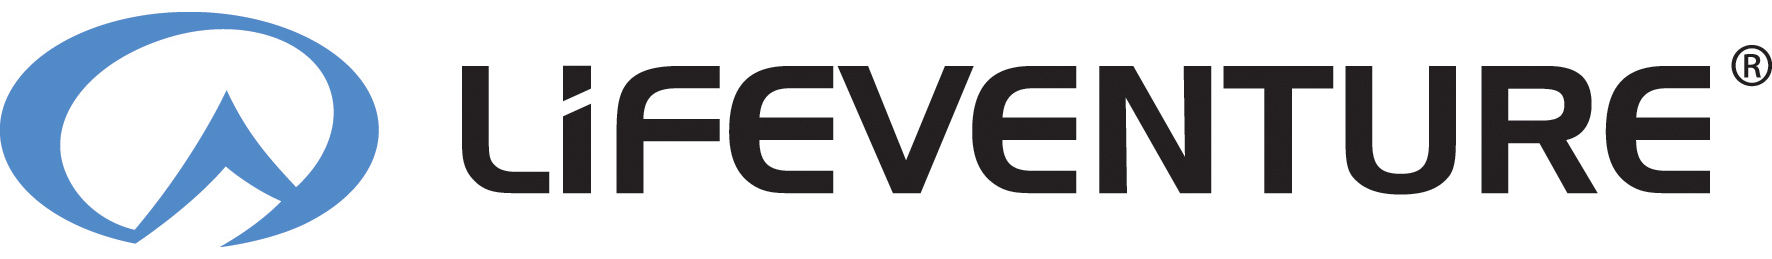 Lifeventure_Logo_3.jpg